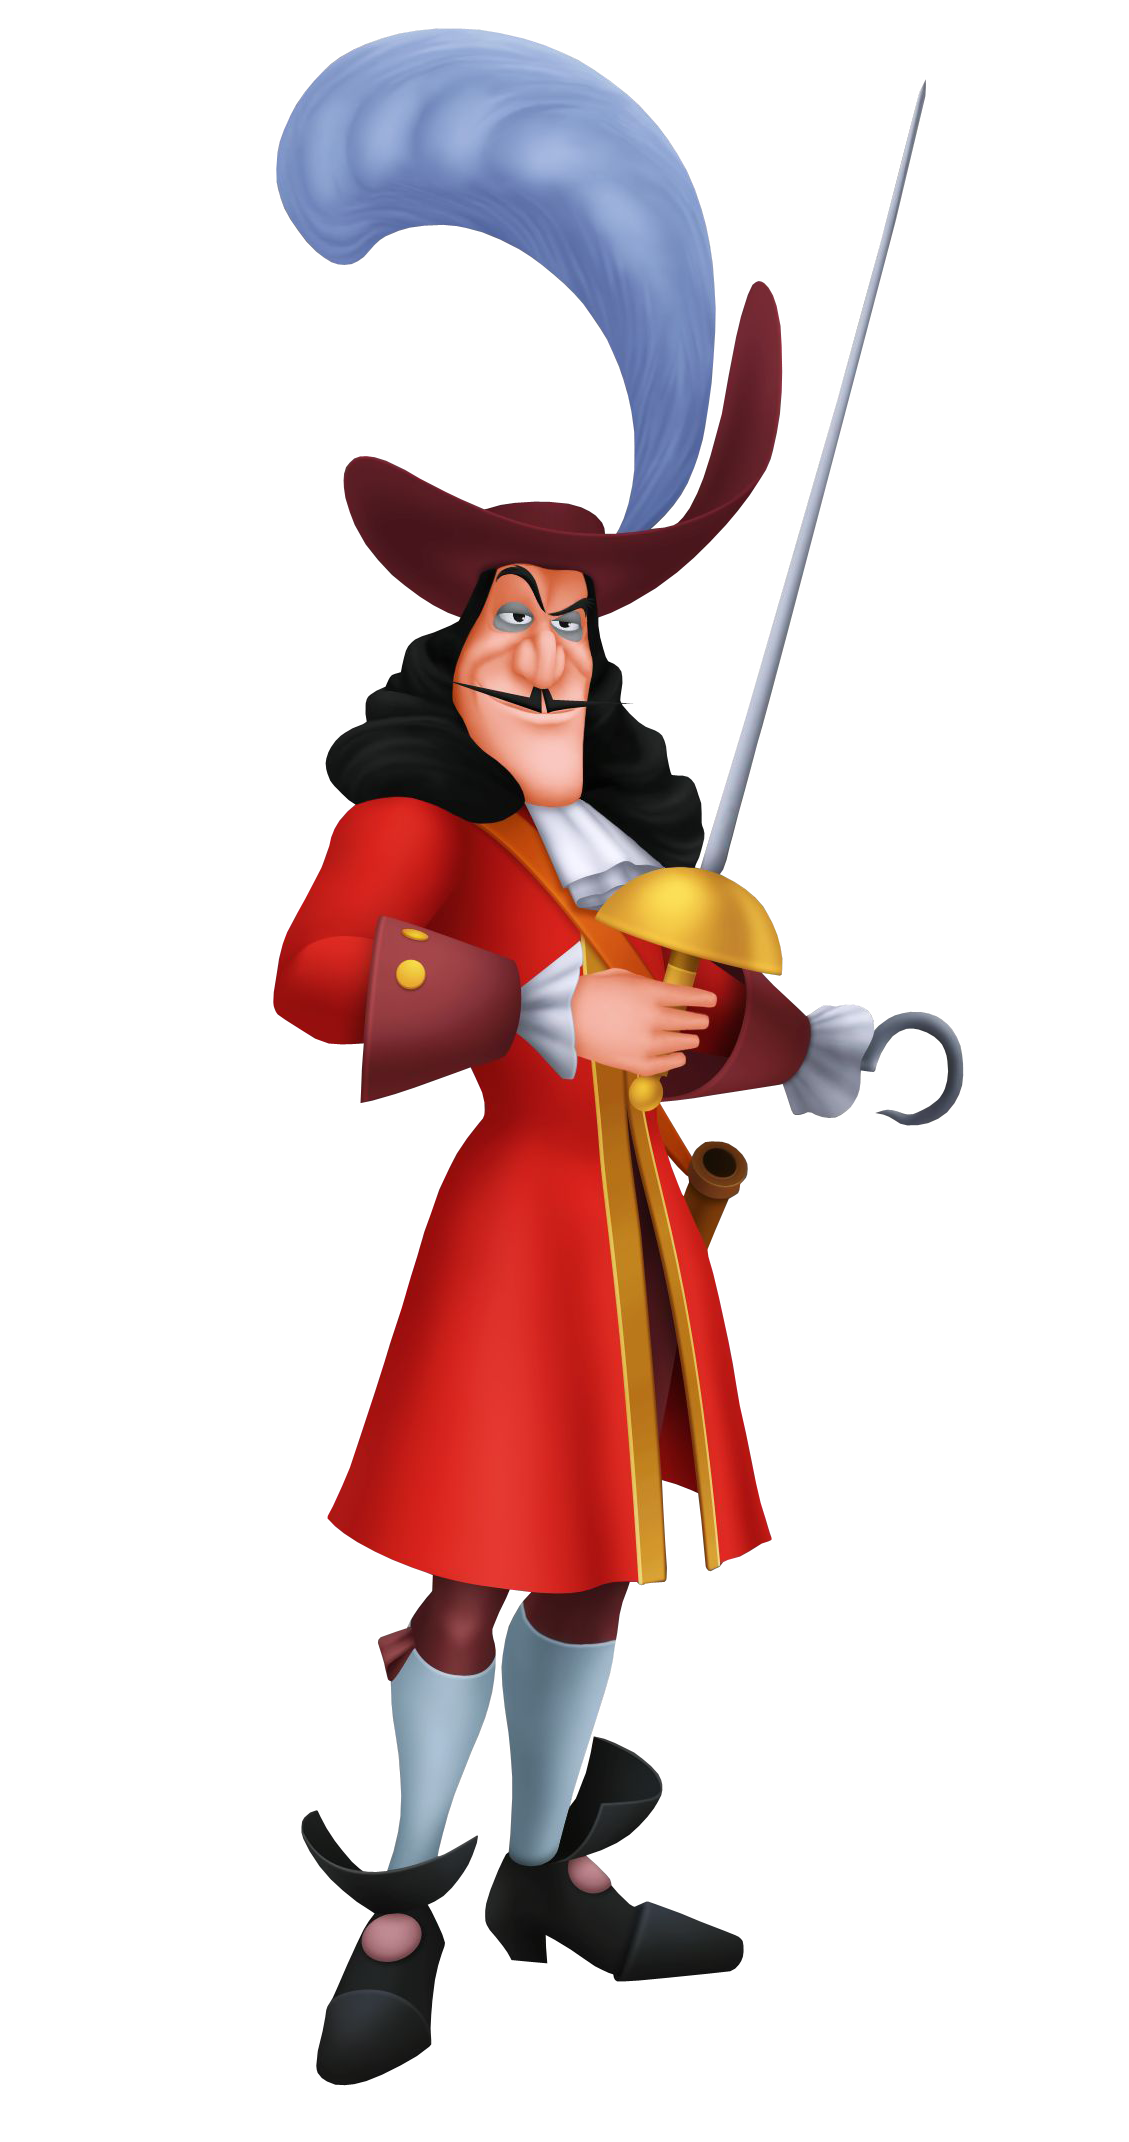 Captain hook pinterest disneywiki. Costume clipart story character